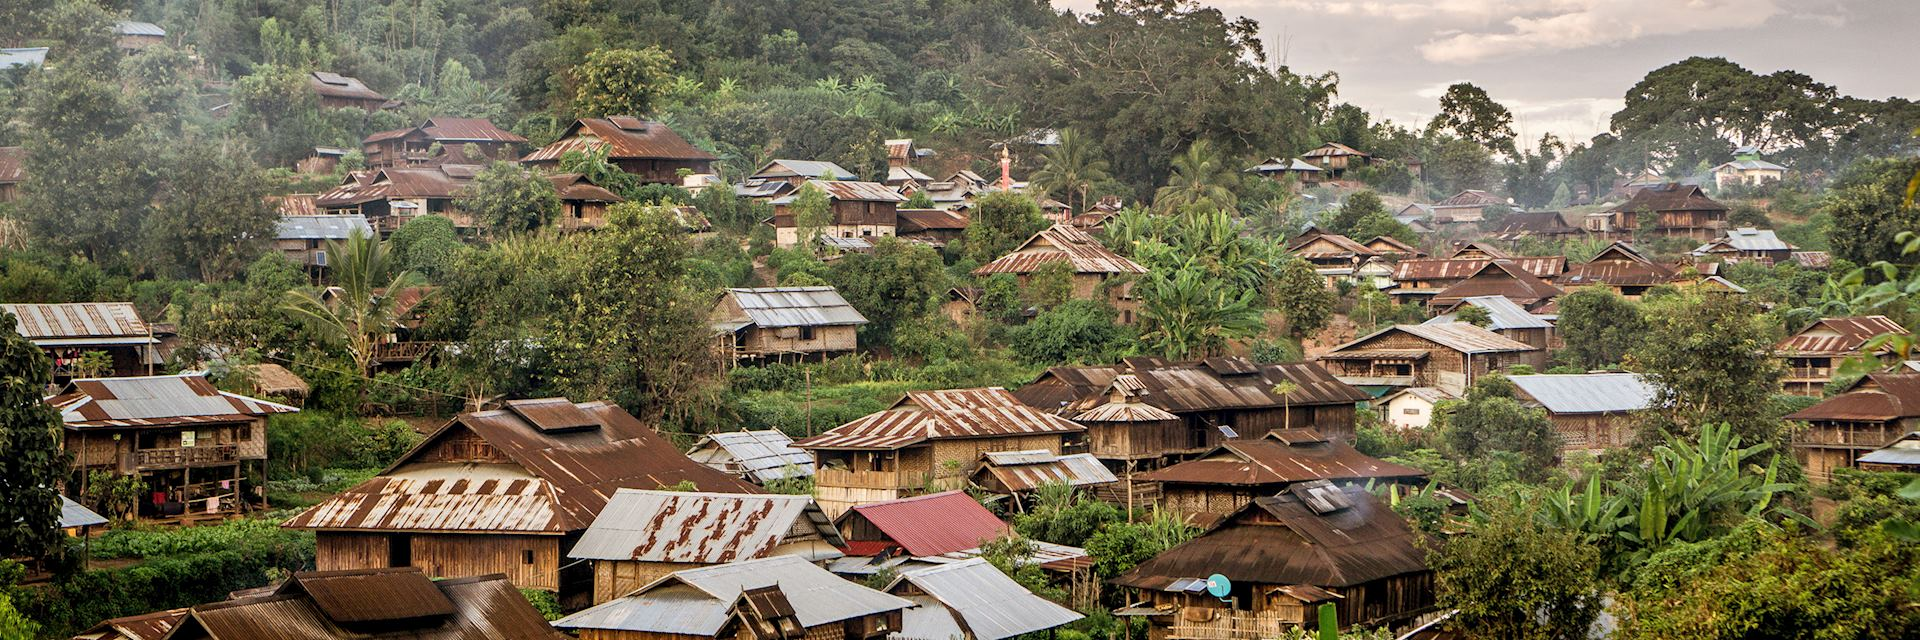 Shan village near Hsipaw